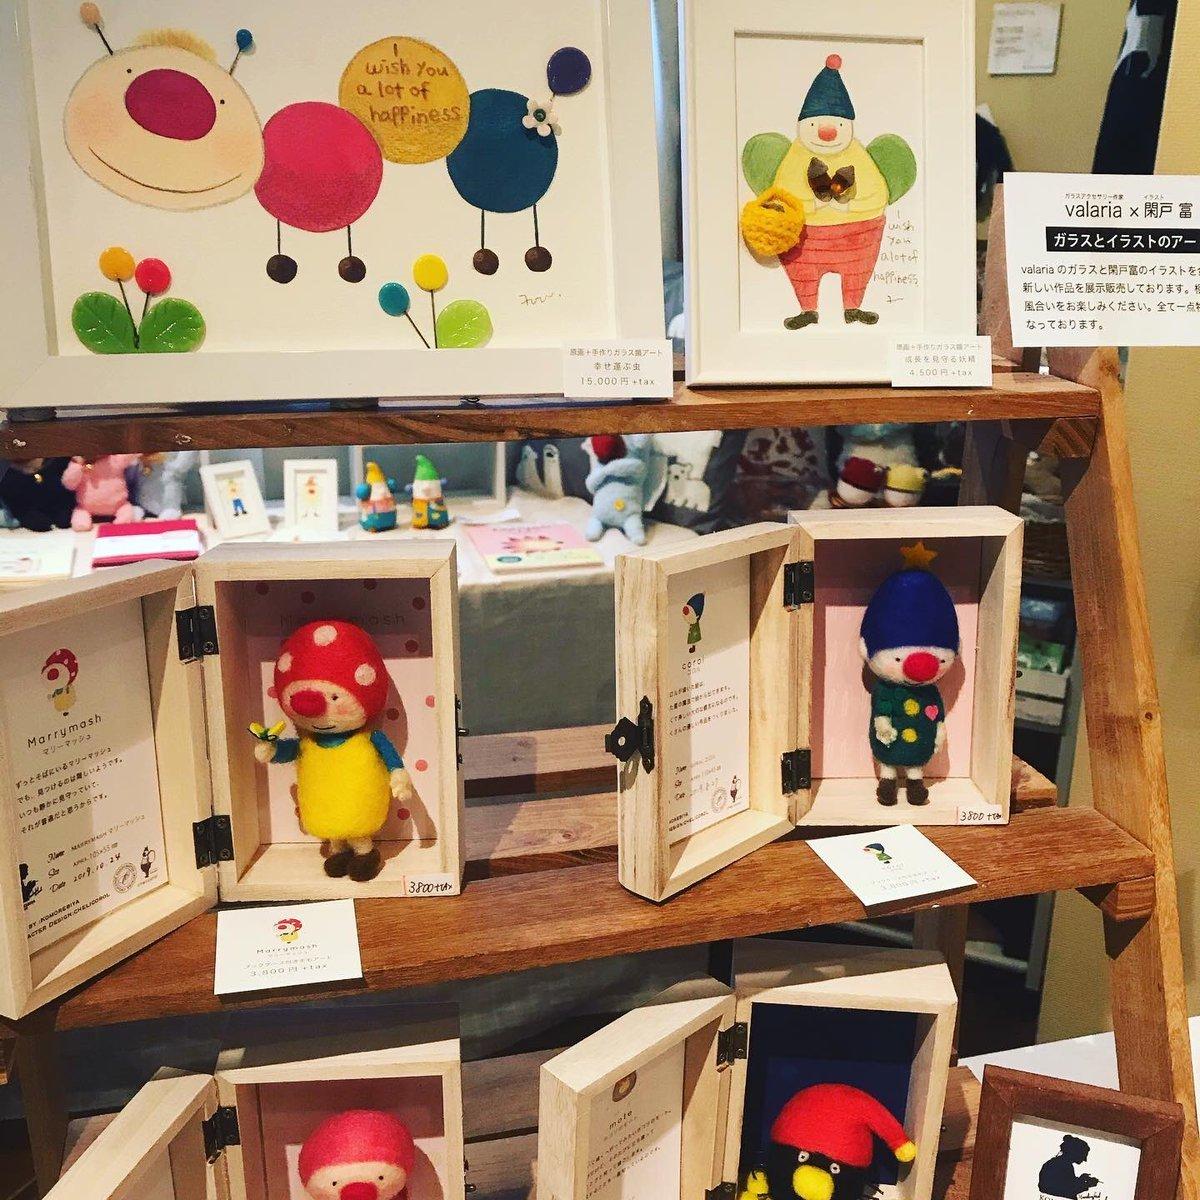 MoterTree個展、インコと鳥の雑貨展終了しました!チェリコロル作品展【星のまほう】開催中!_d0322493_00471020.jpg